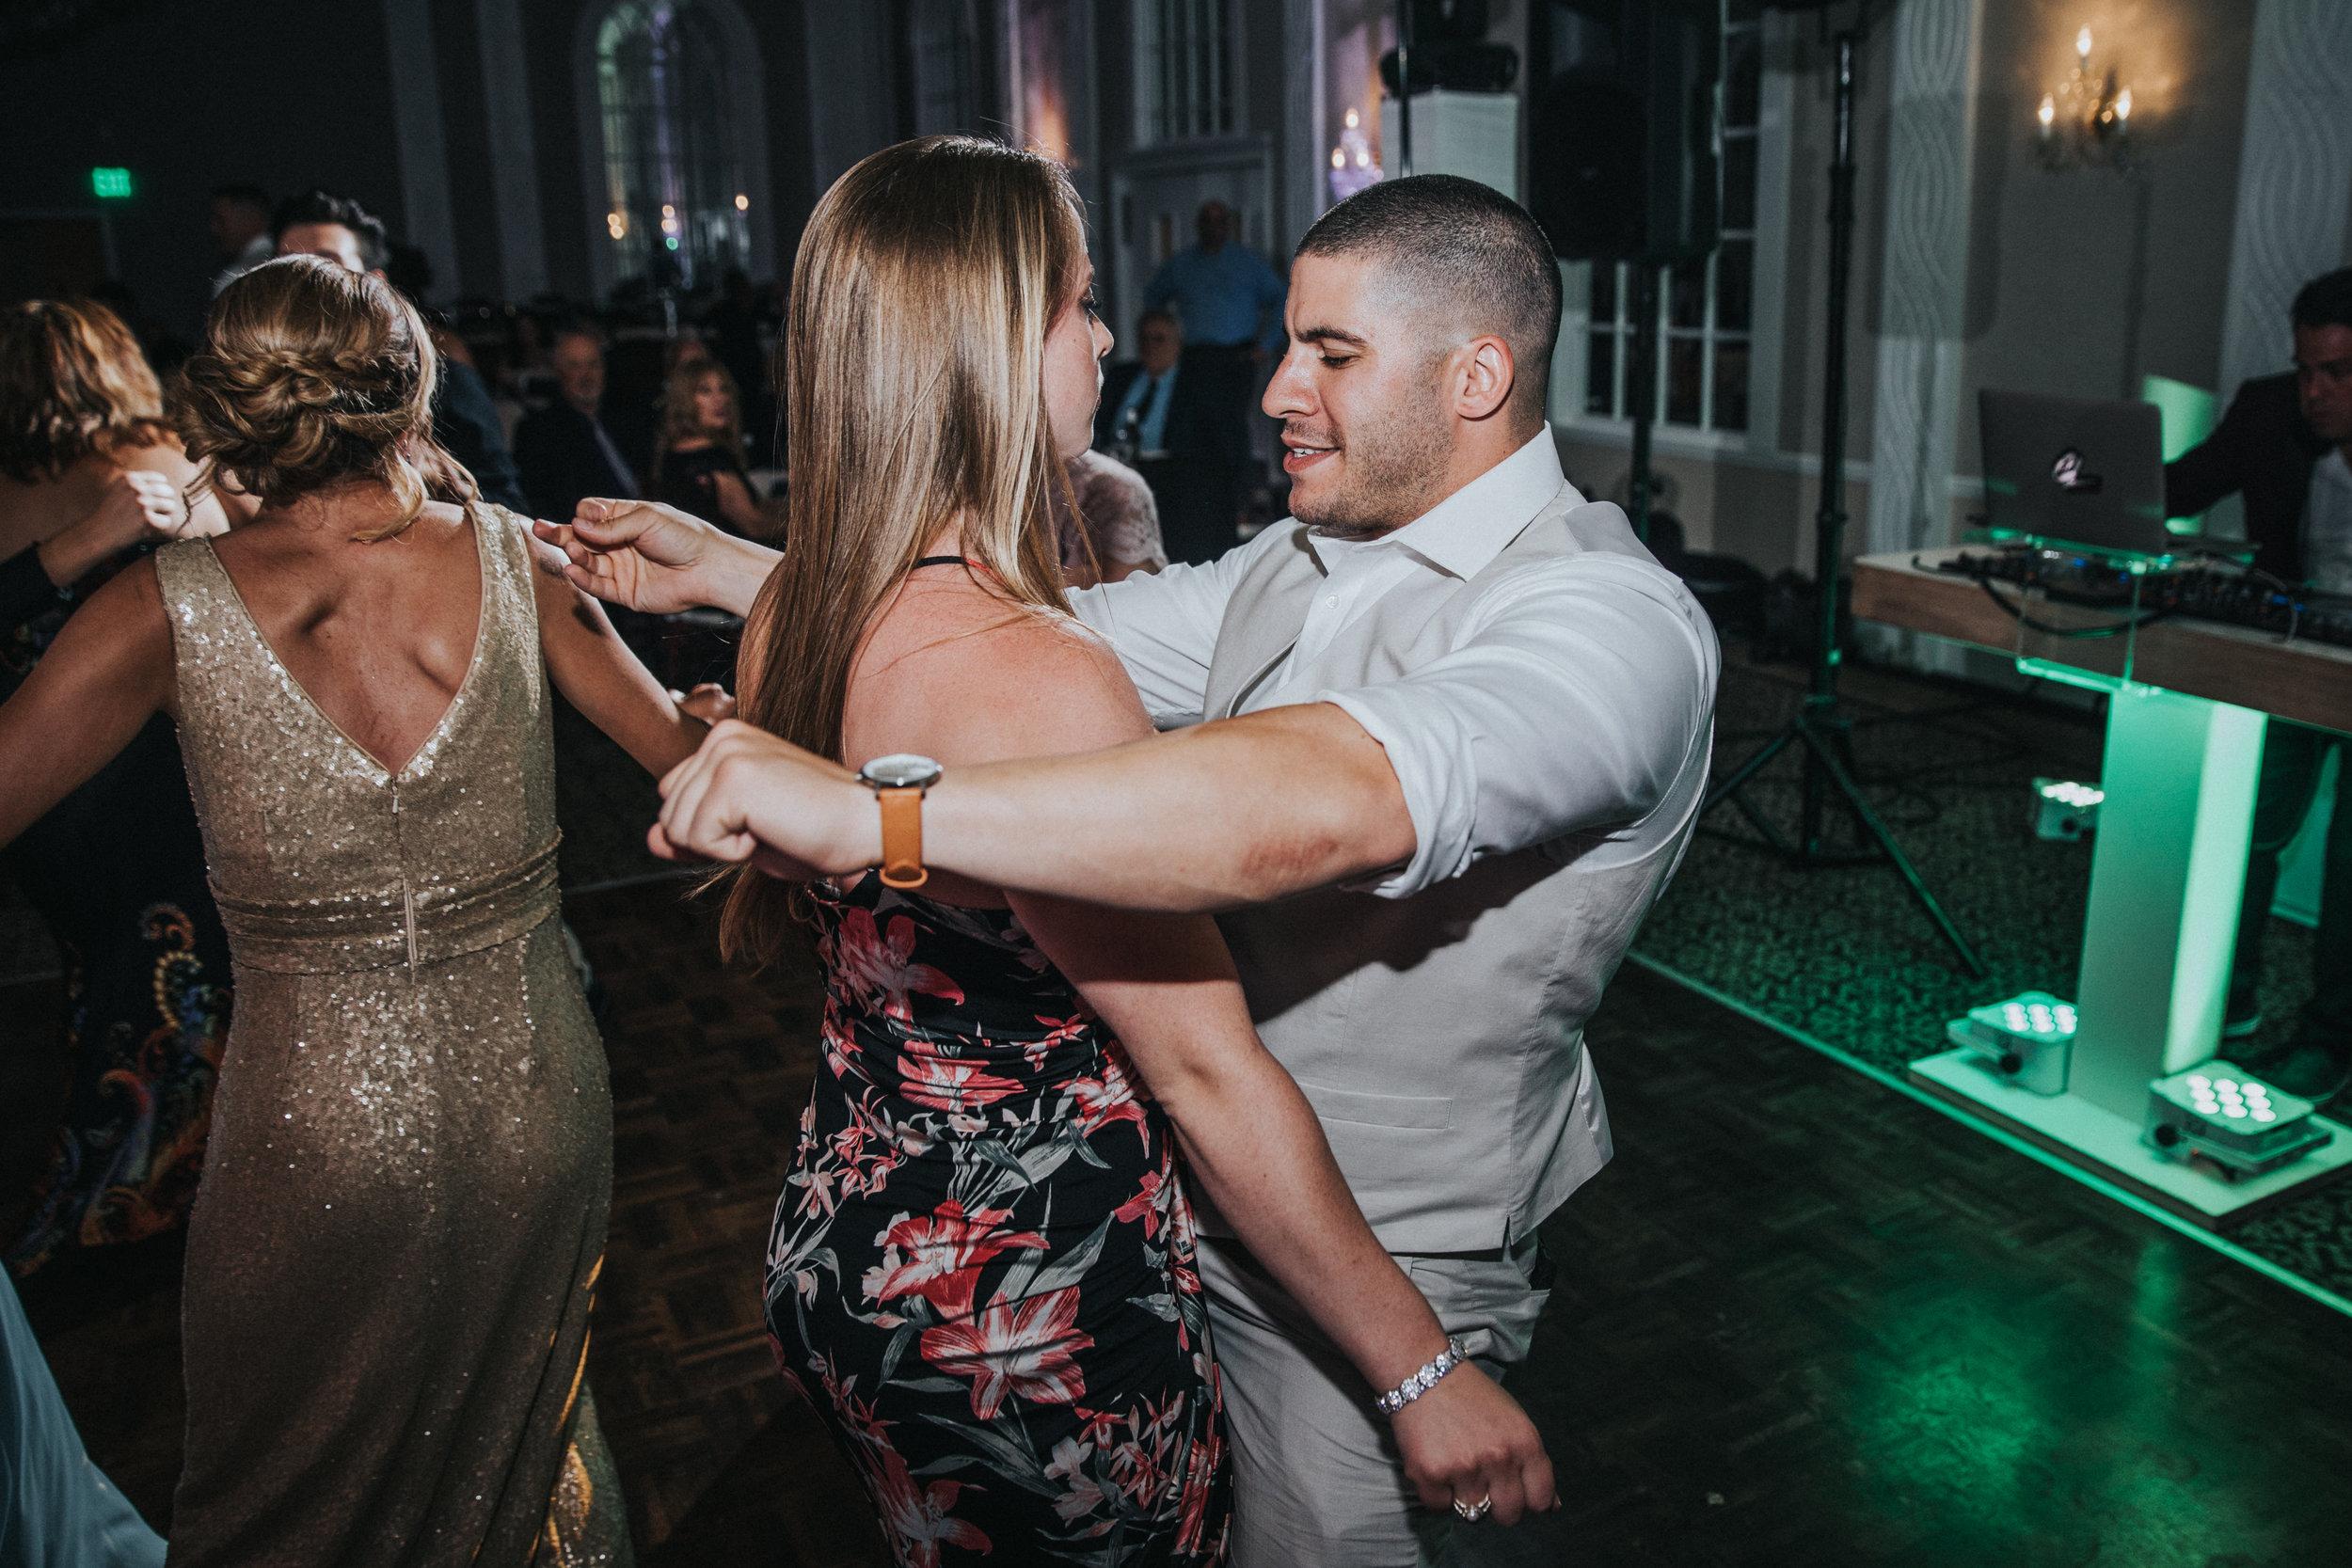 JennaLynnPhotography-NJWeddingPhotographer-Wedding-TheBerkeley-AsburyPark-Allison&Michael-Reception-139.jpg